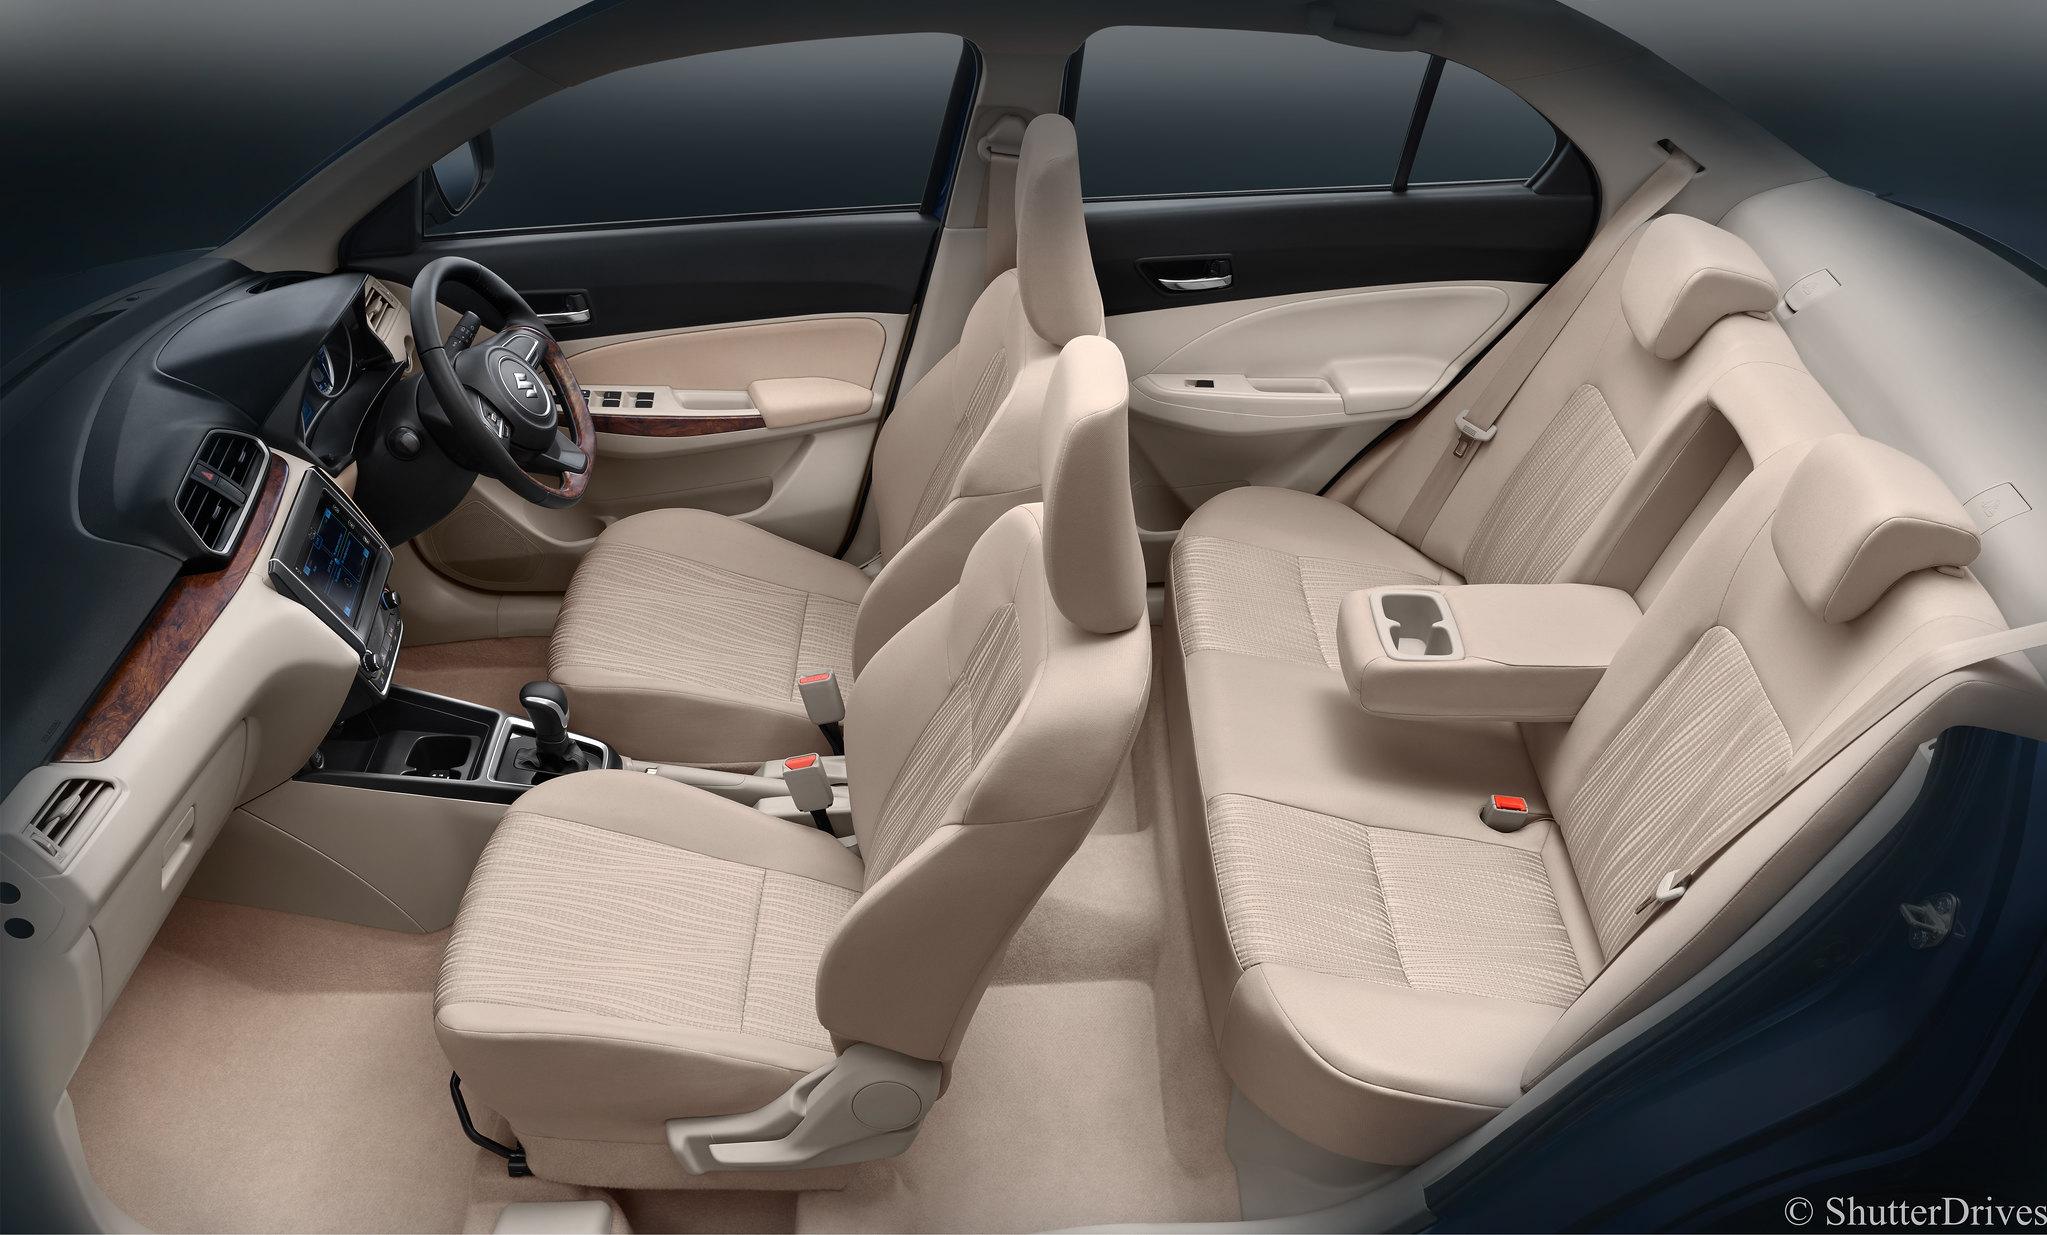 all-new-dzire-interior_33850388030_o